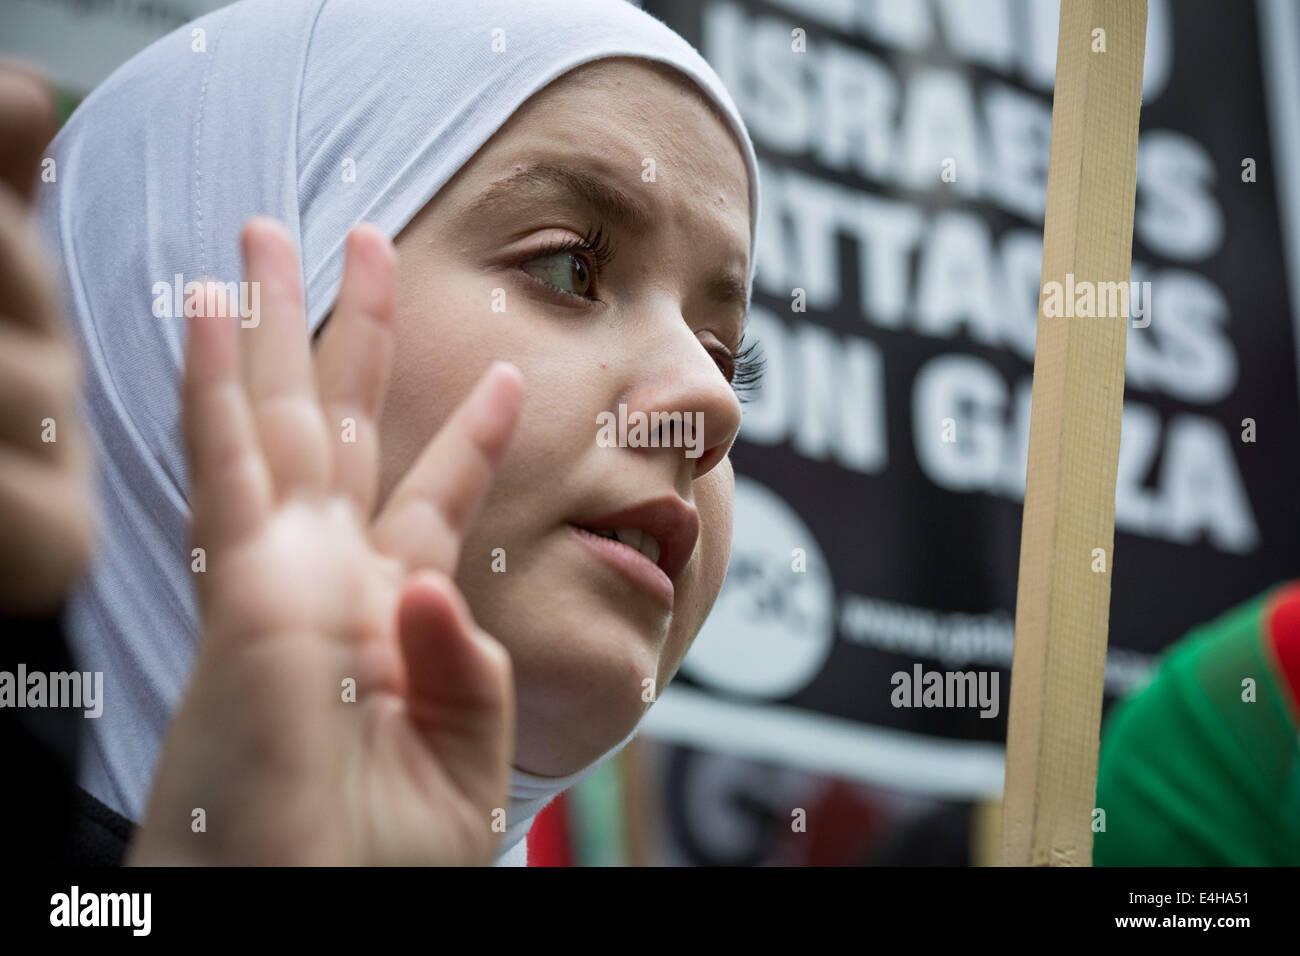 London, UK. 11th July, 2014. London: Thousands protest against Israeli air-strikes on Gaza Credit:  Guy Corbishley/Alamy - Stock Image